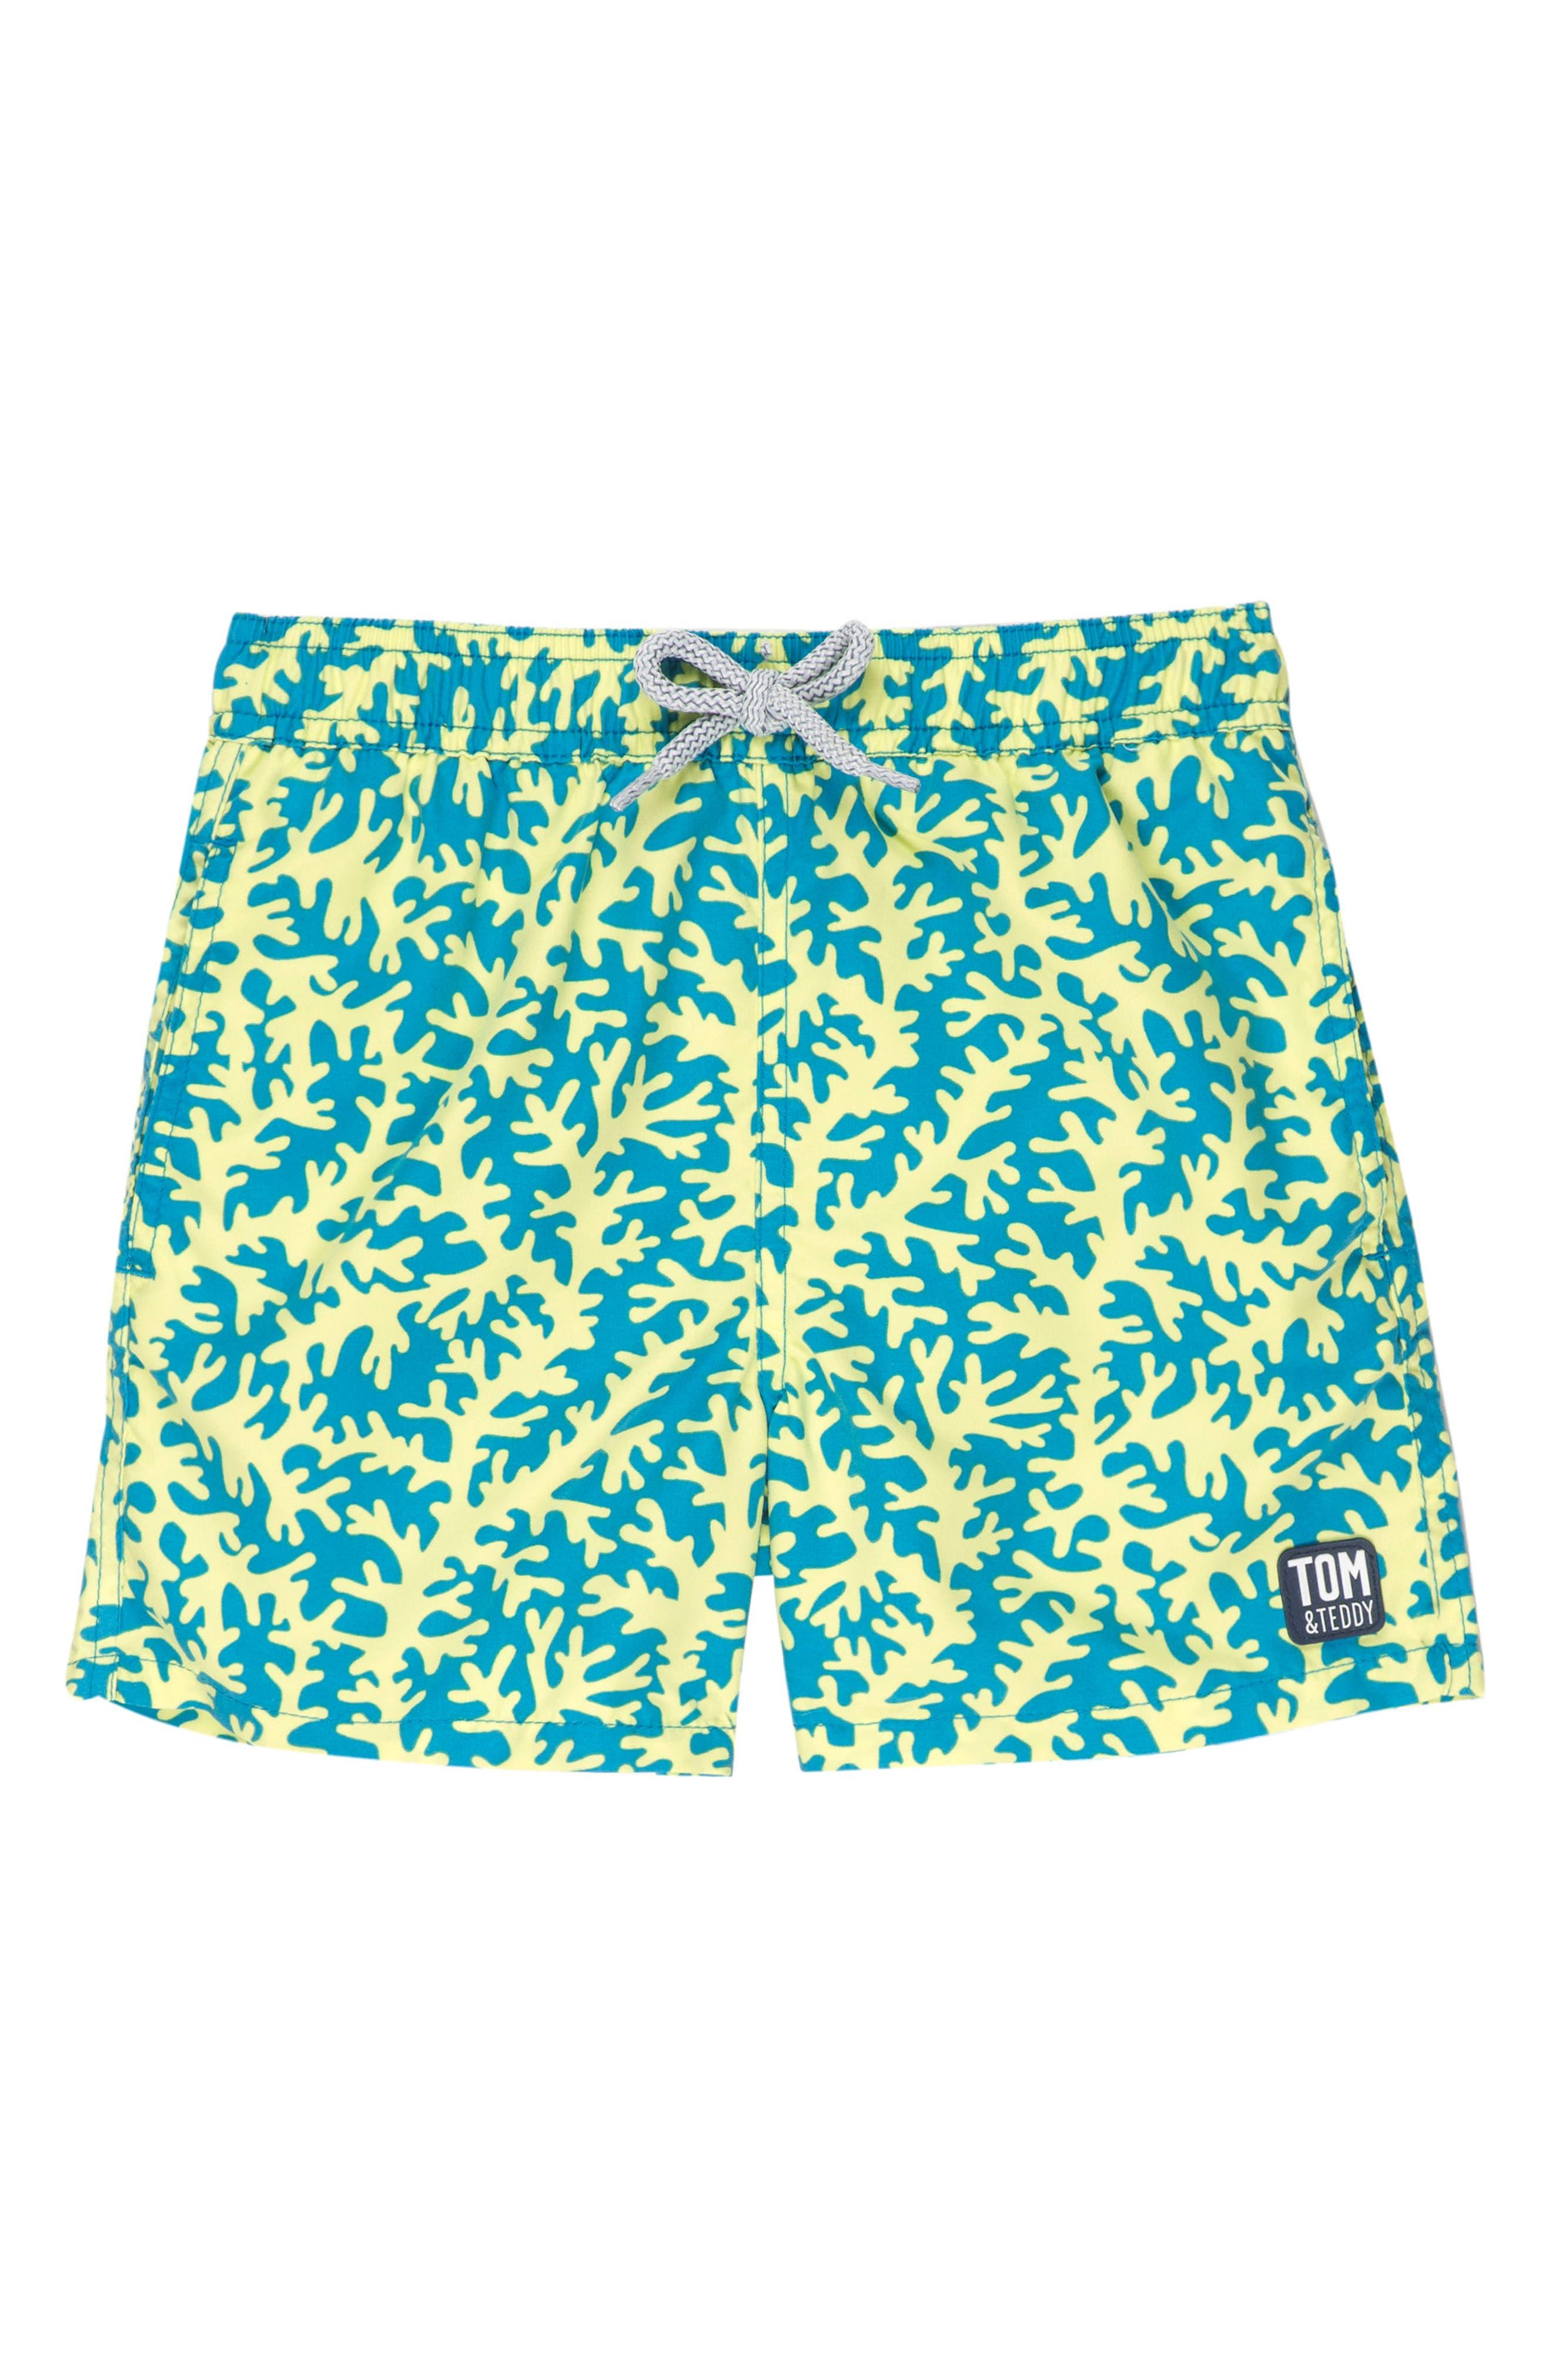 Coral Swim Trunks,                         Main,                         color,